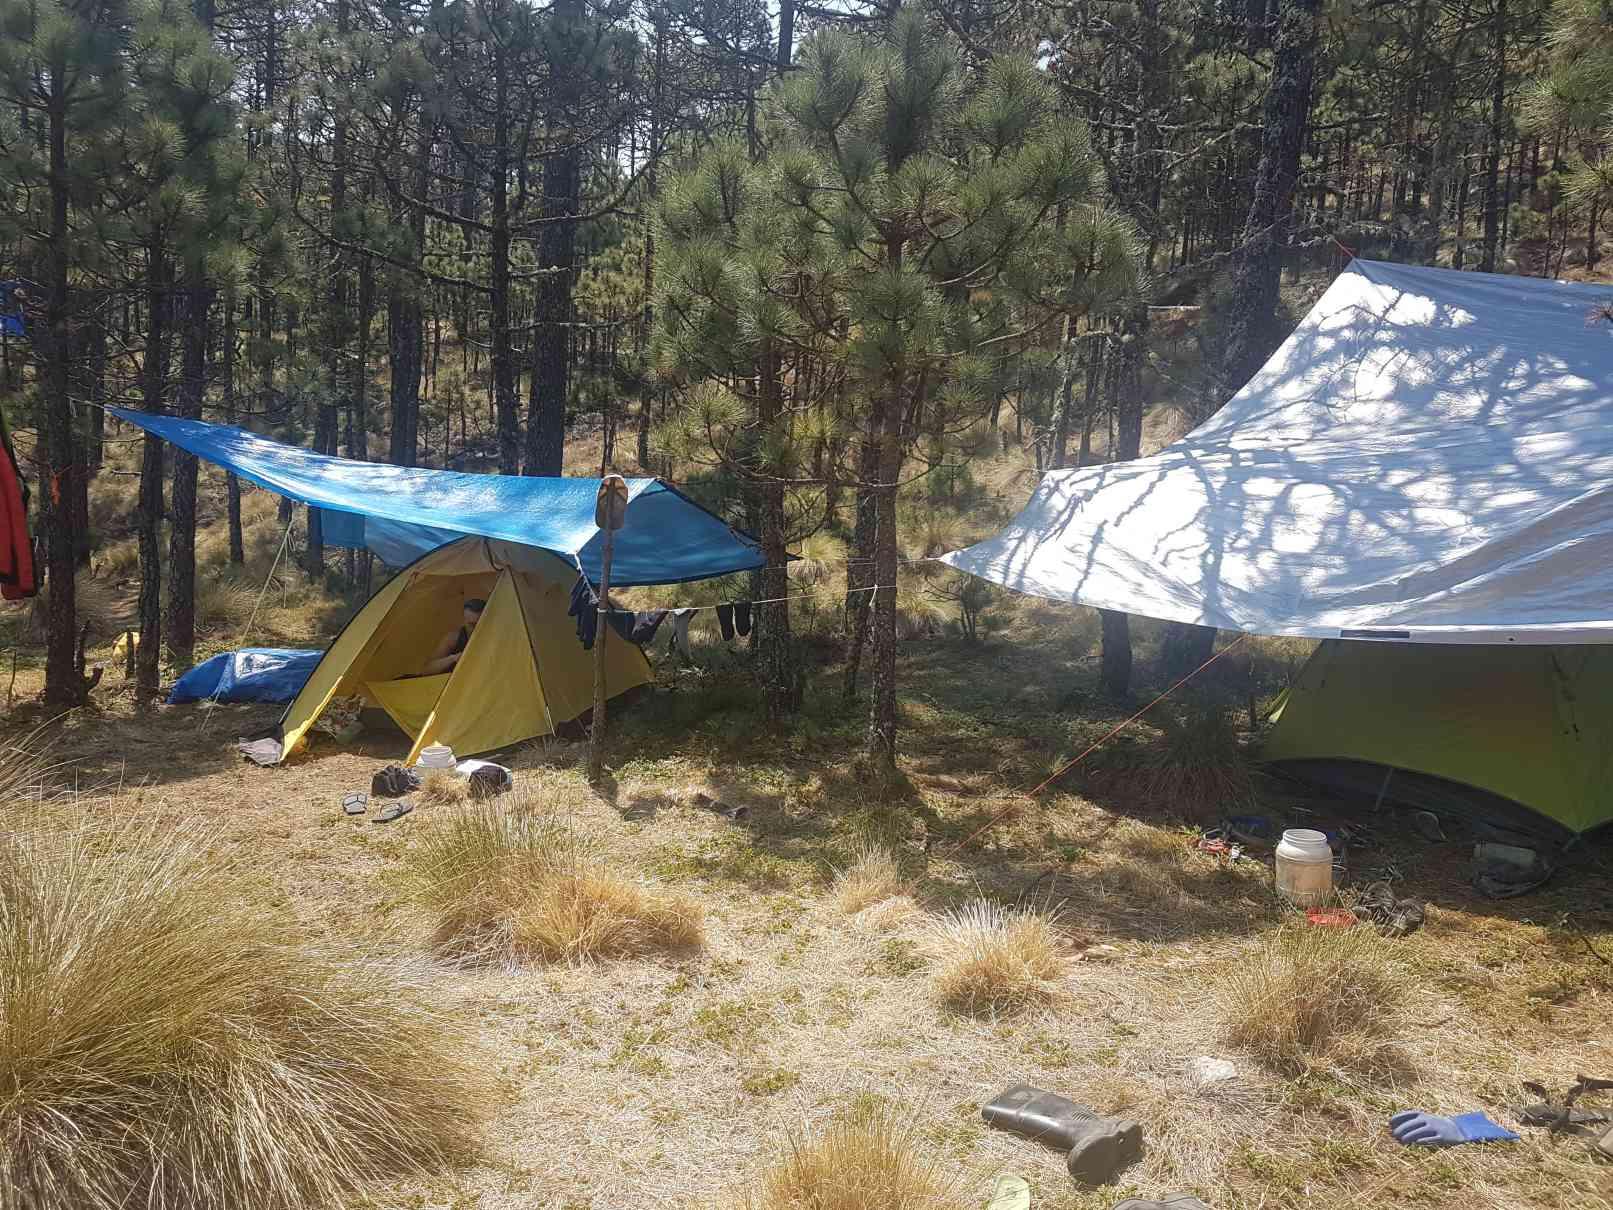 Nasz namiot na bazie_resize